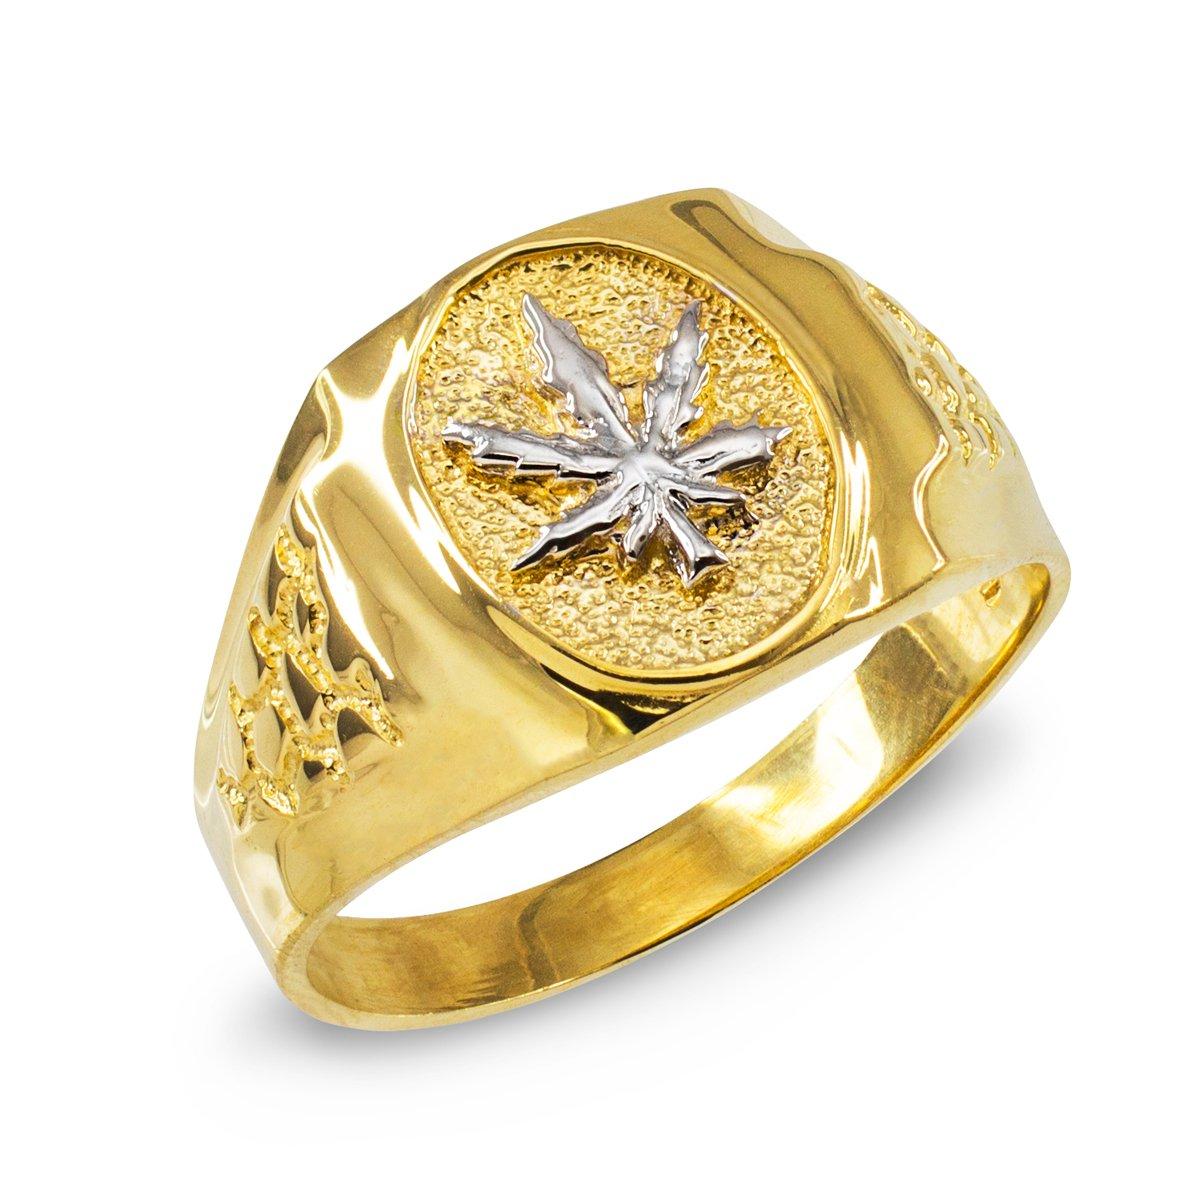 Men's High Polish 10k Yellow Gold 420 Pot Ganja Weed Cannabis Marijuana Leaf Ring (Size 9.25)